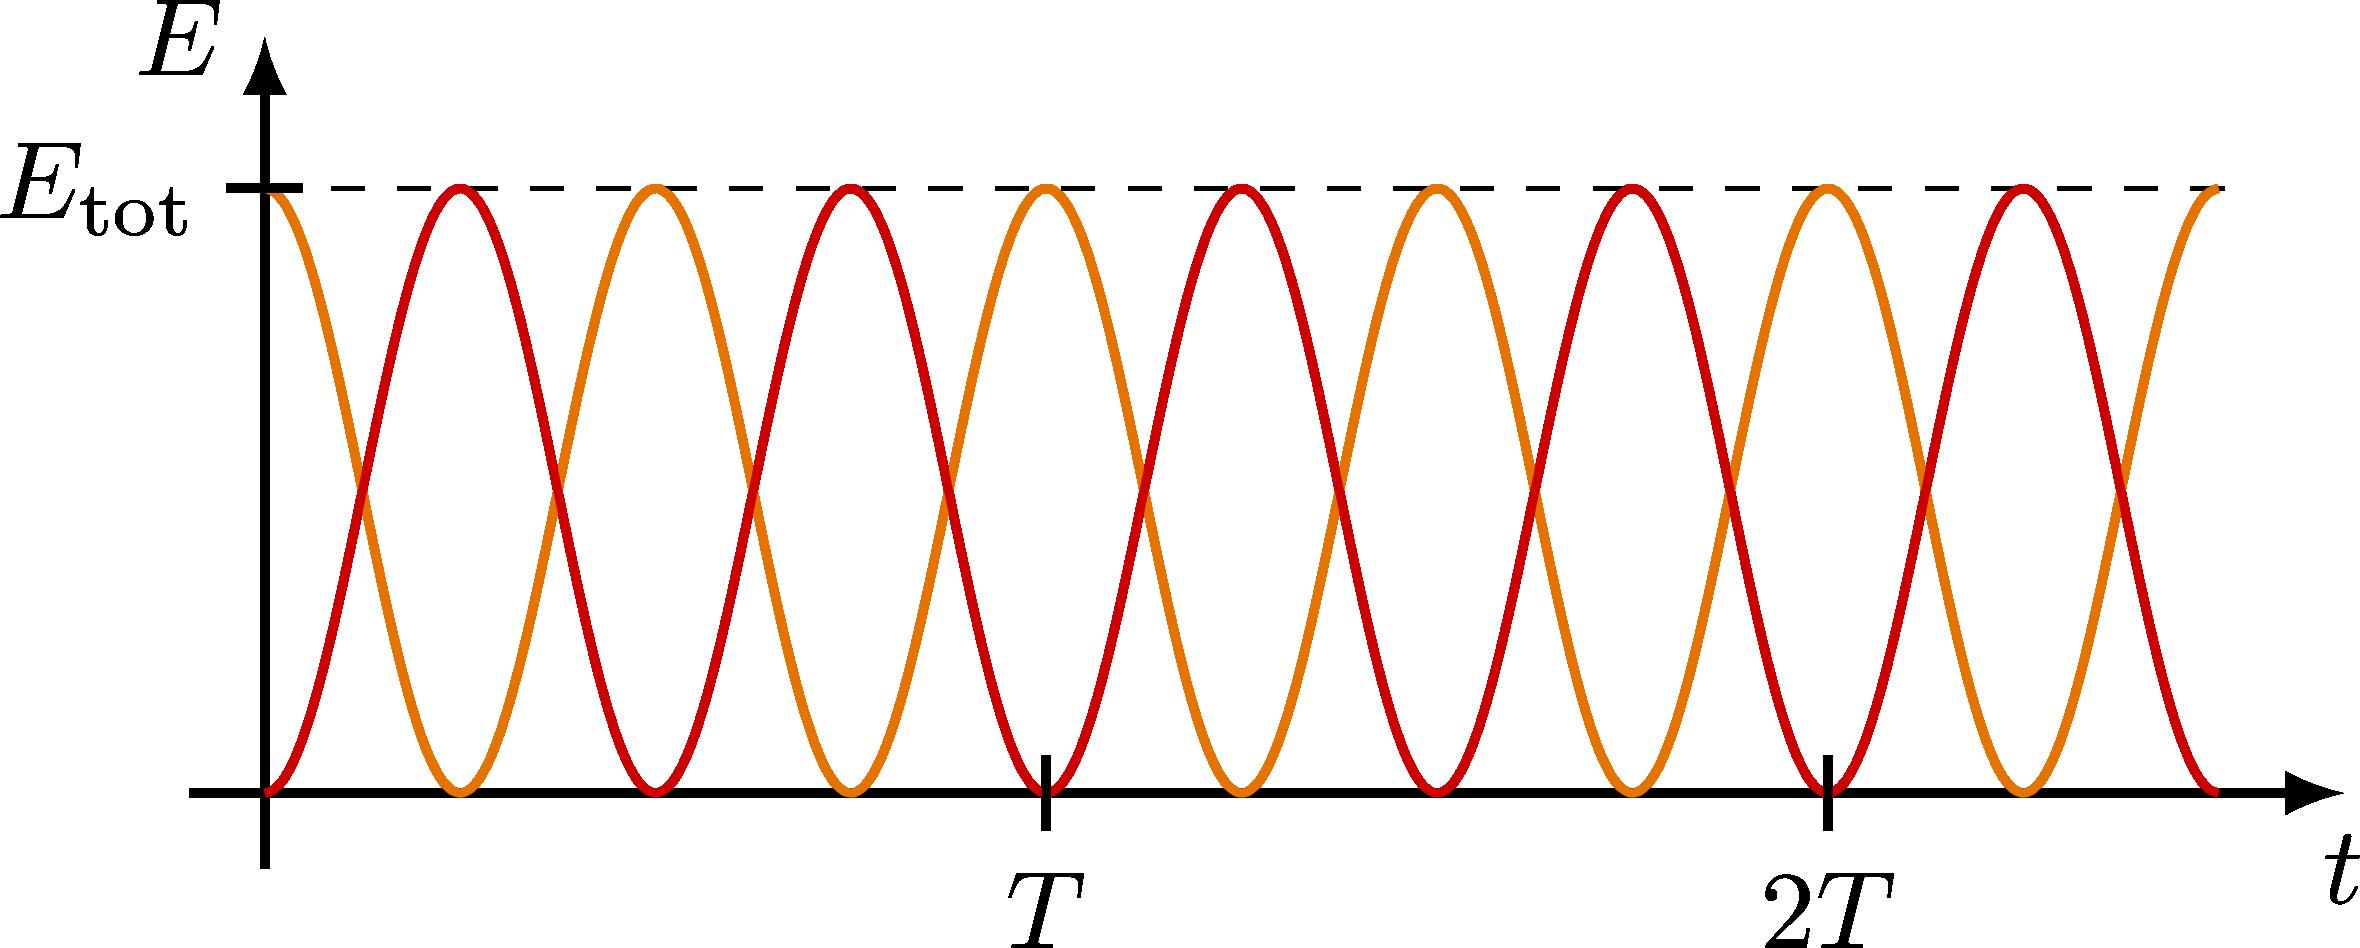 dynamics_oscillator-009.png